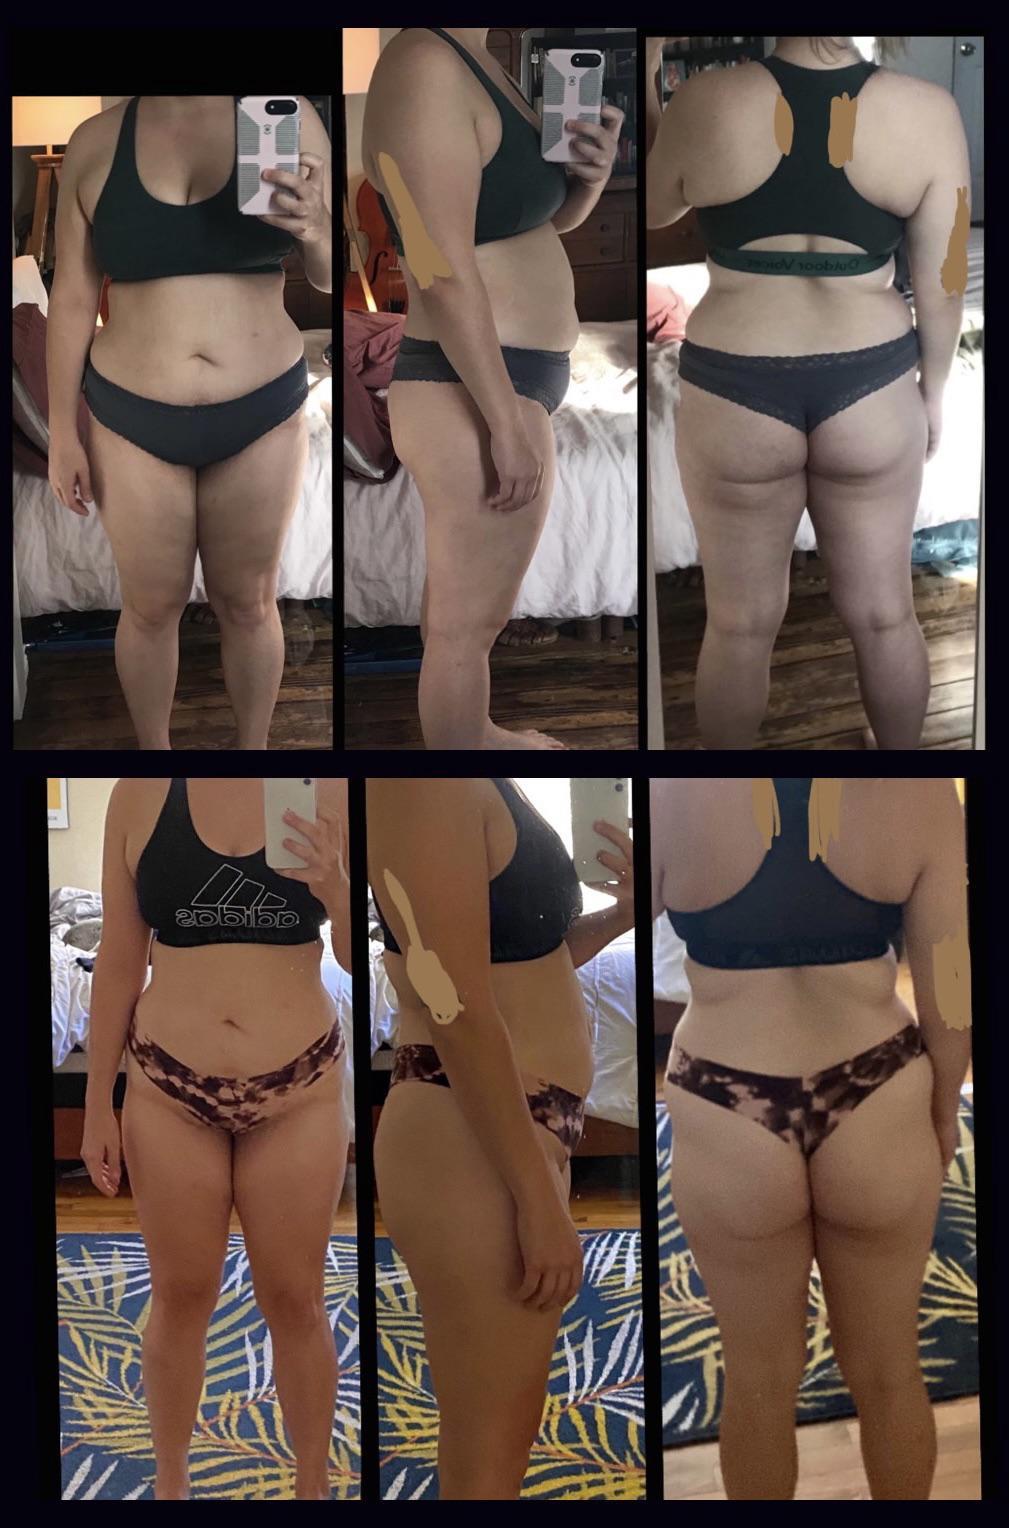 5 feet 4 Female 21 lbs Fat Loss 176 lbs to 155 lbs